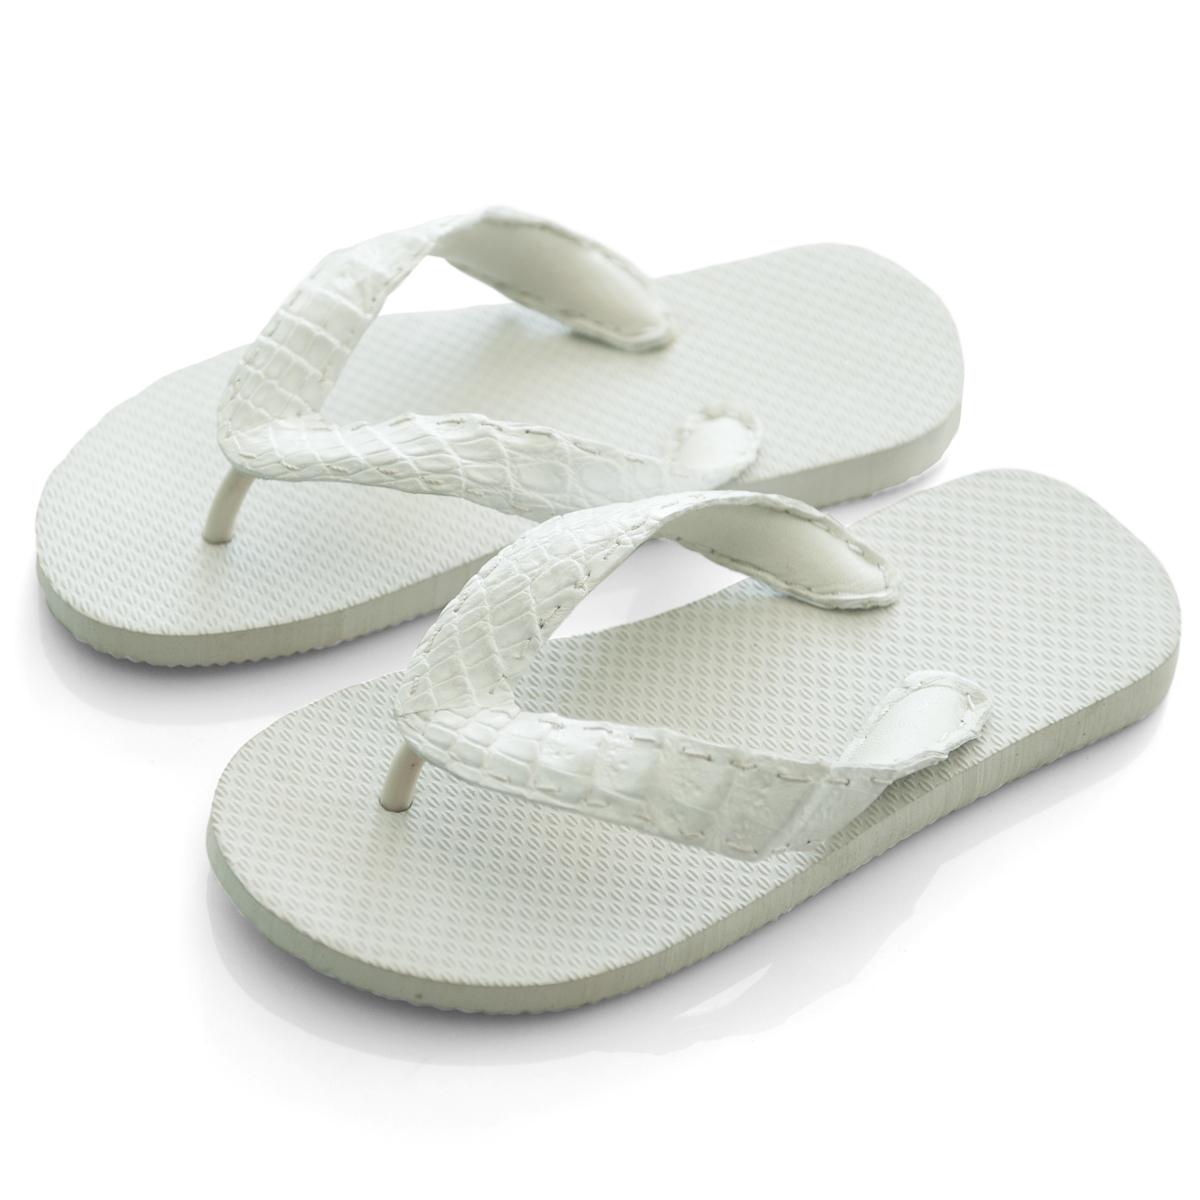 Alligator Shoes For Sale